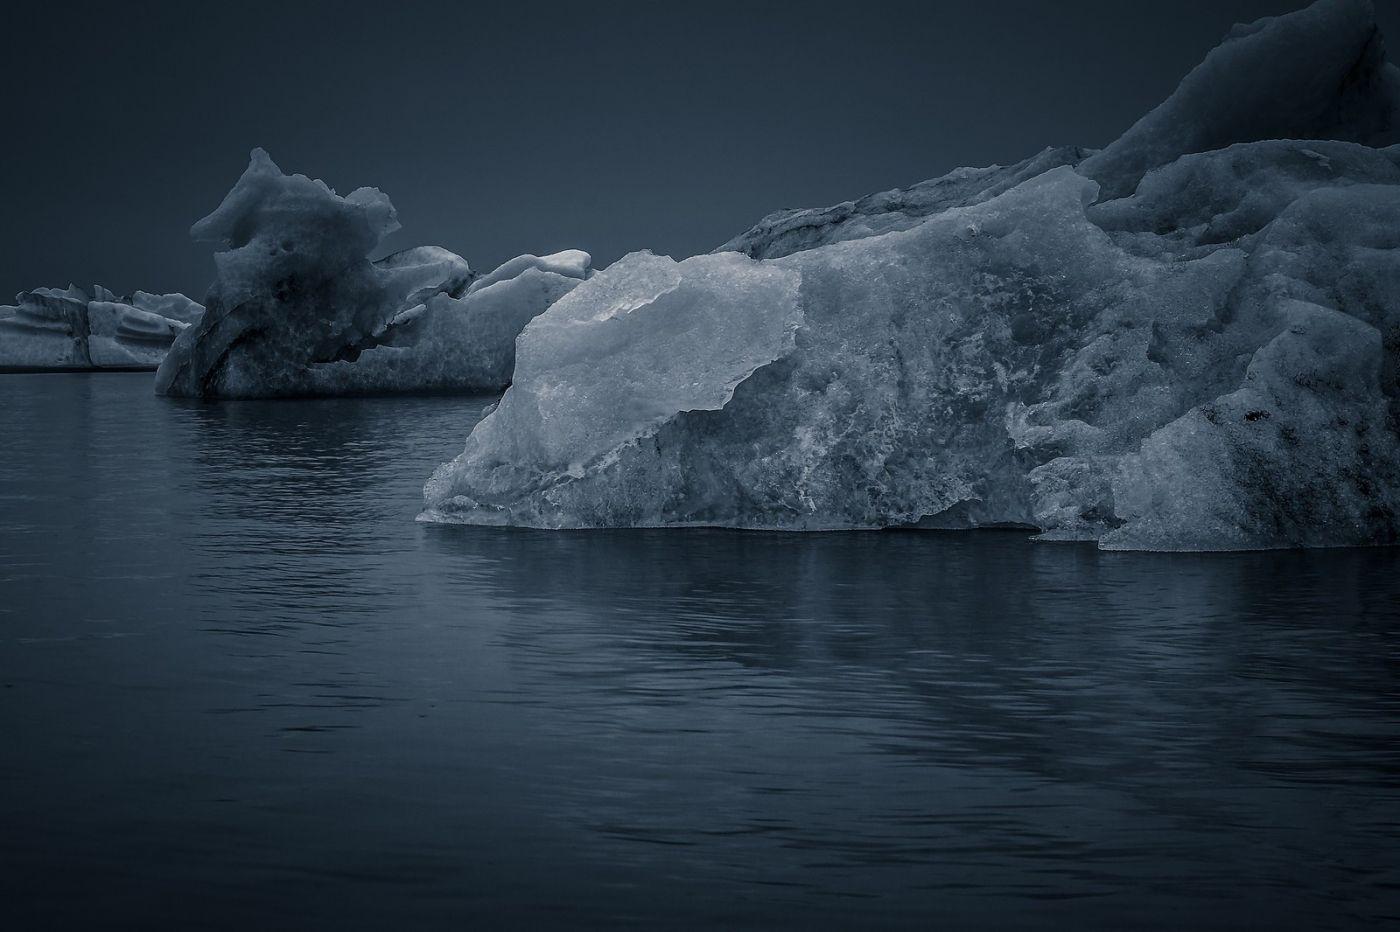 冰岛冰川泻湖(Glacier Lagoon),流动的冰川_图1-11